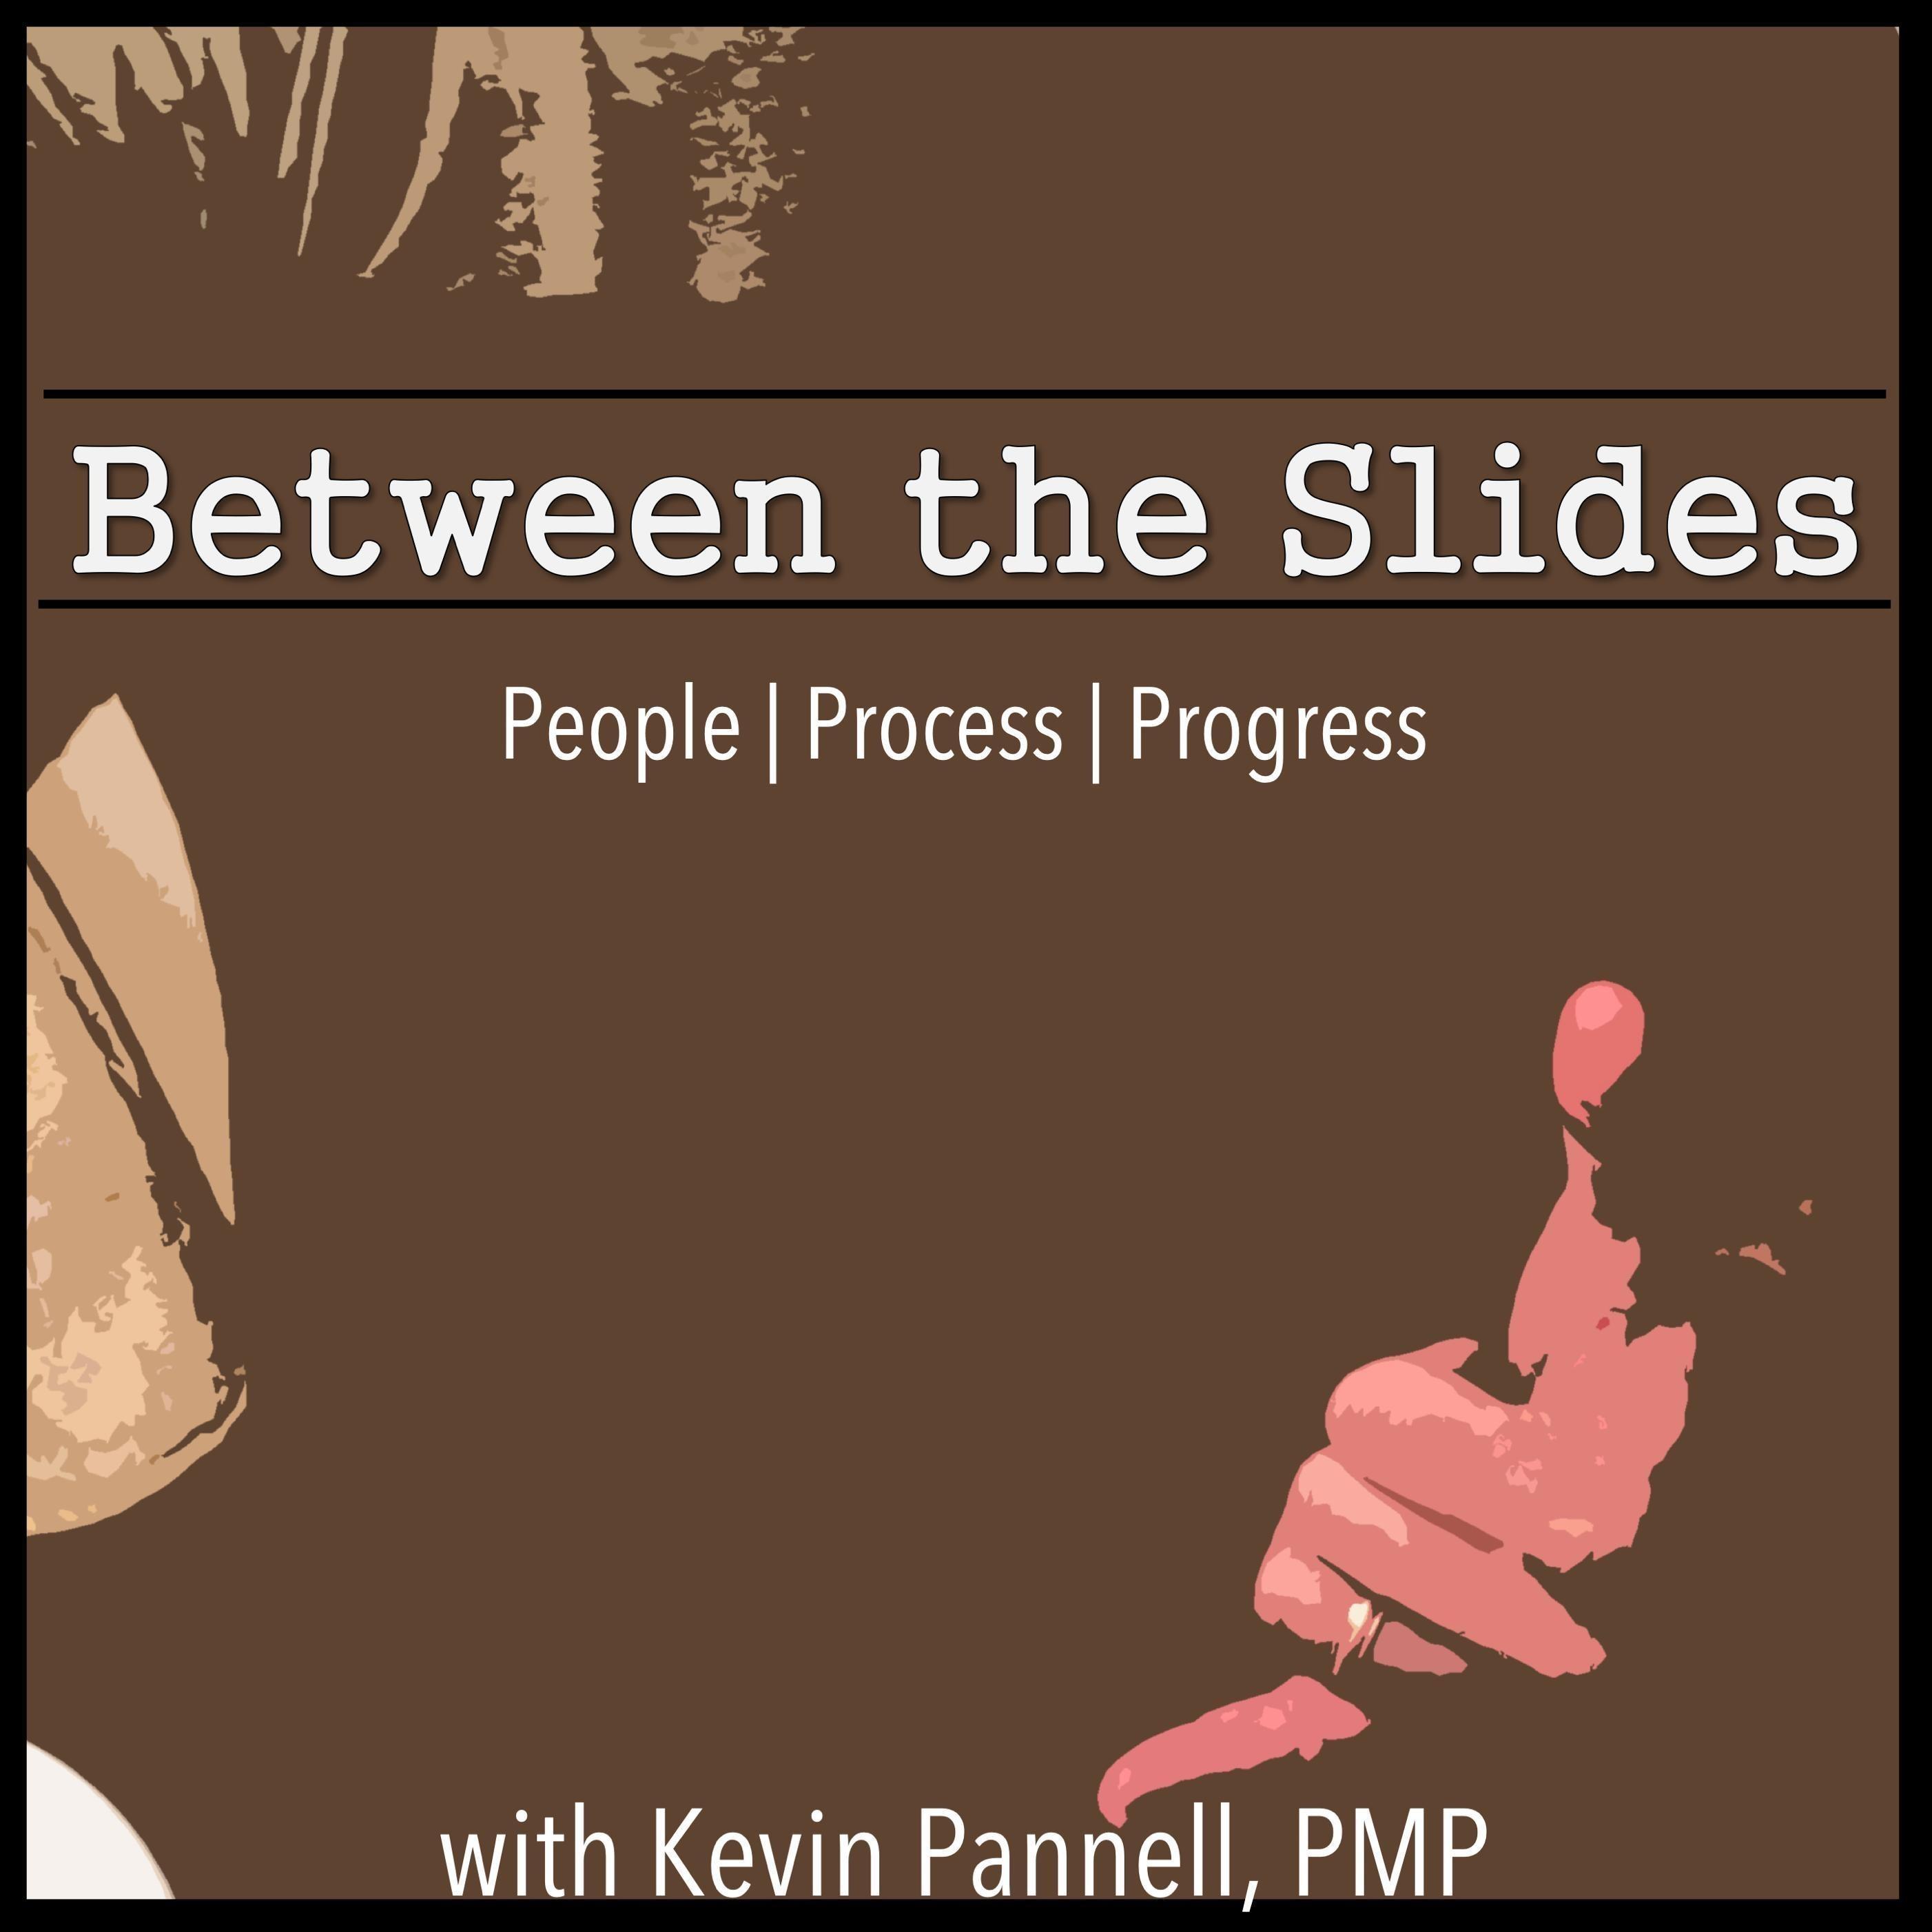 Between the Slides